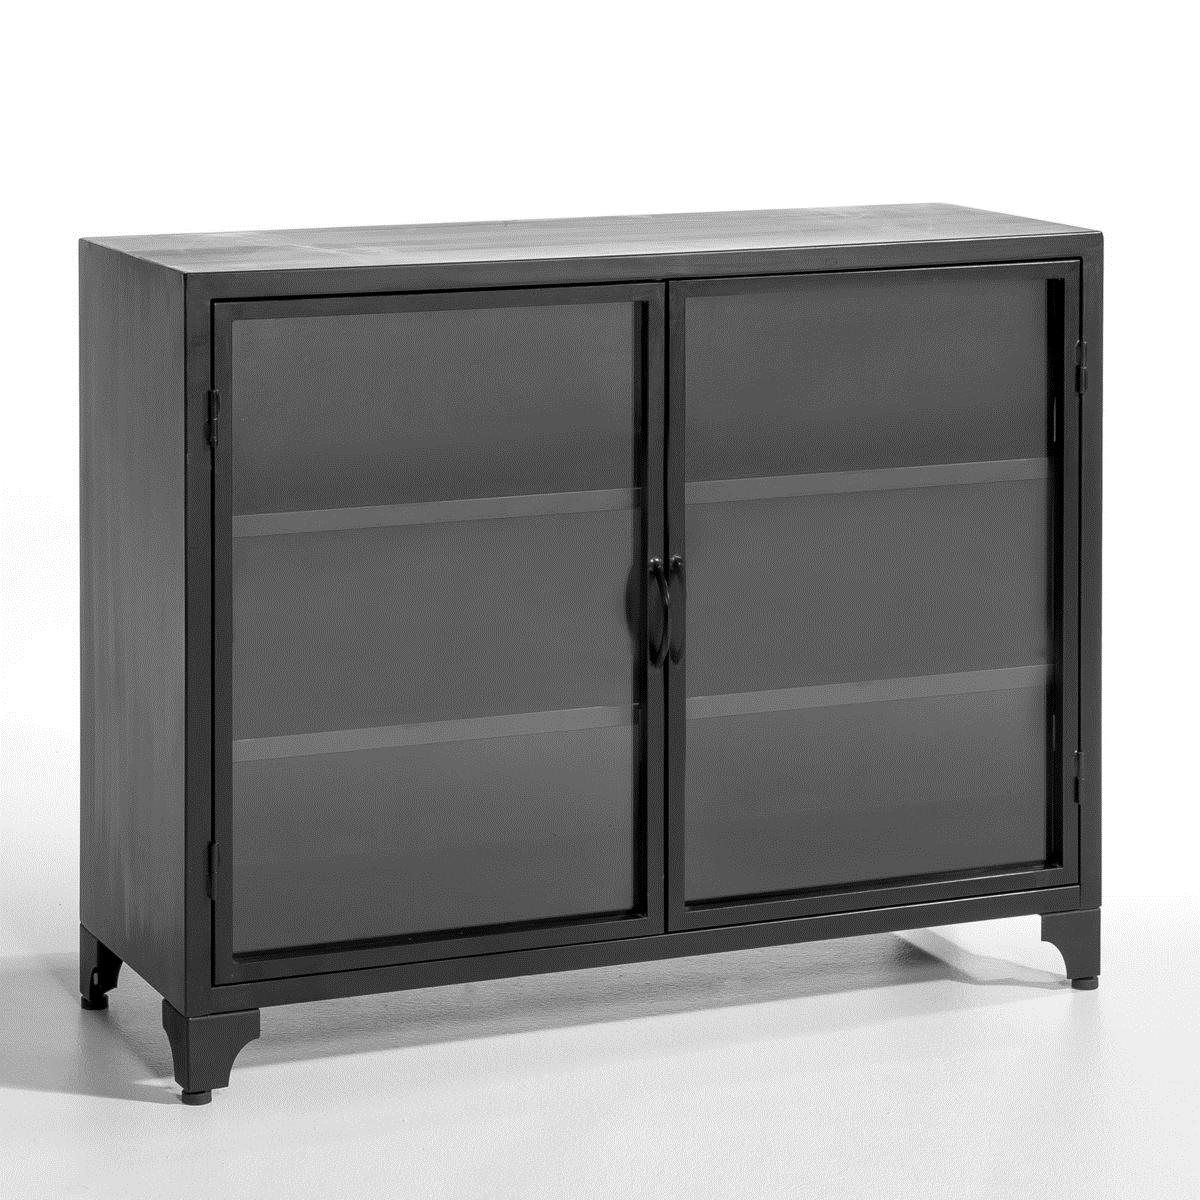 meuble bas kargo m tal portes vitr es achat meuble la. Black Bedroom Furniture Sets. Home Design Ideas